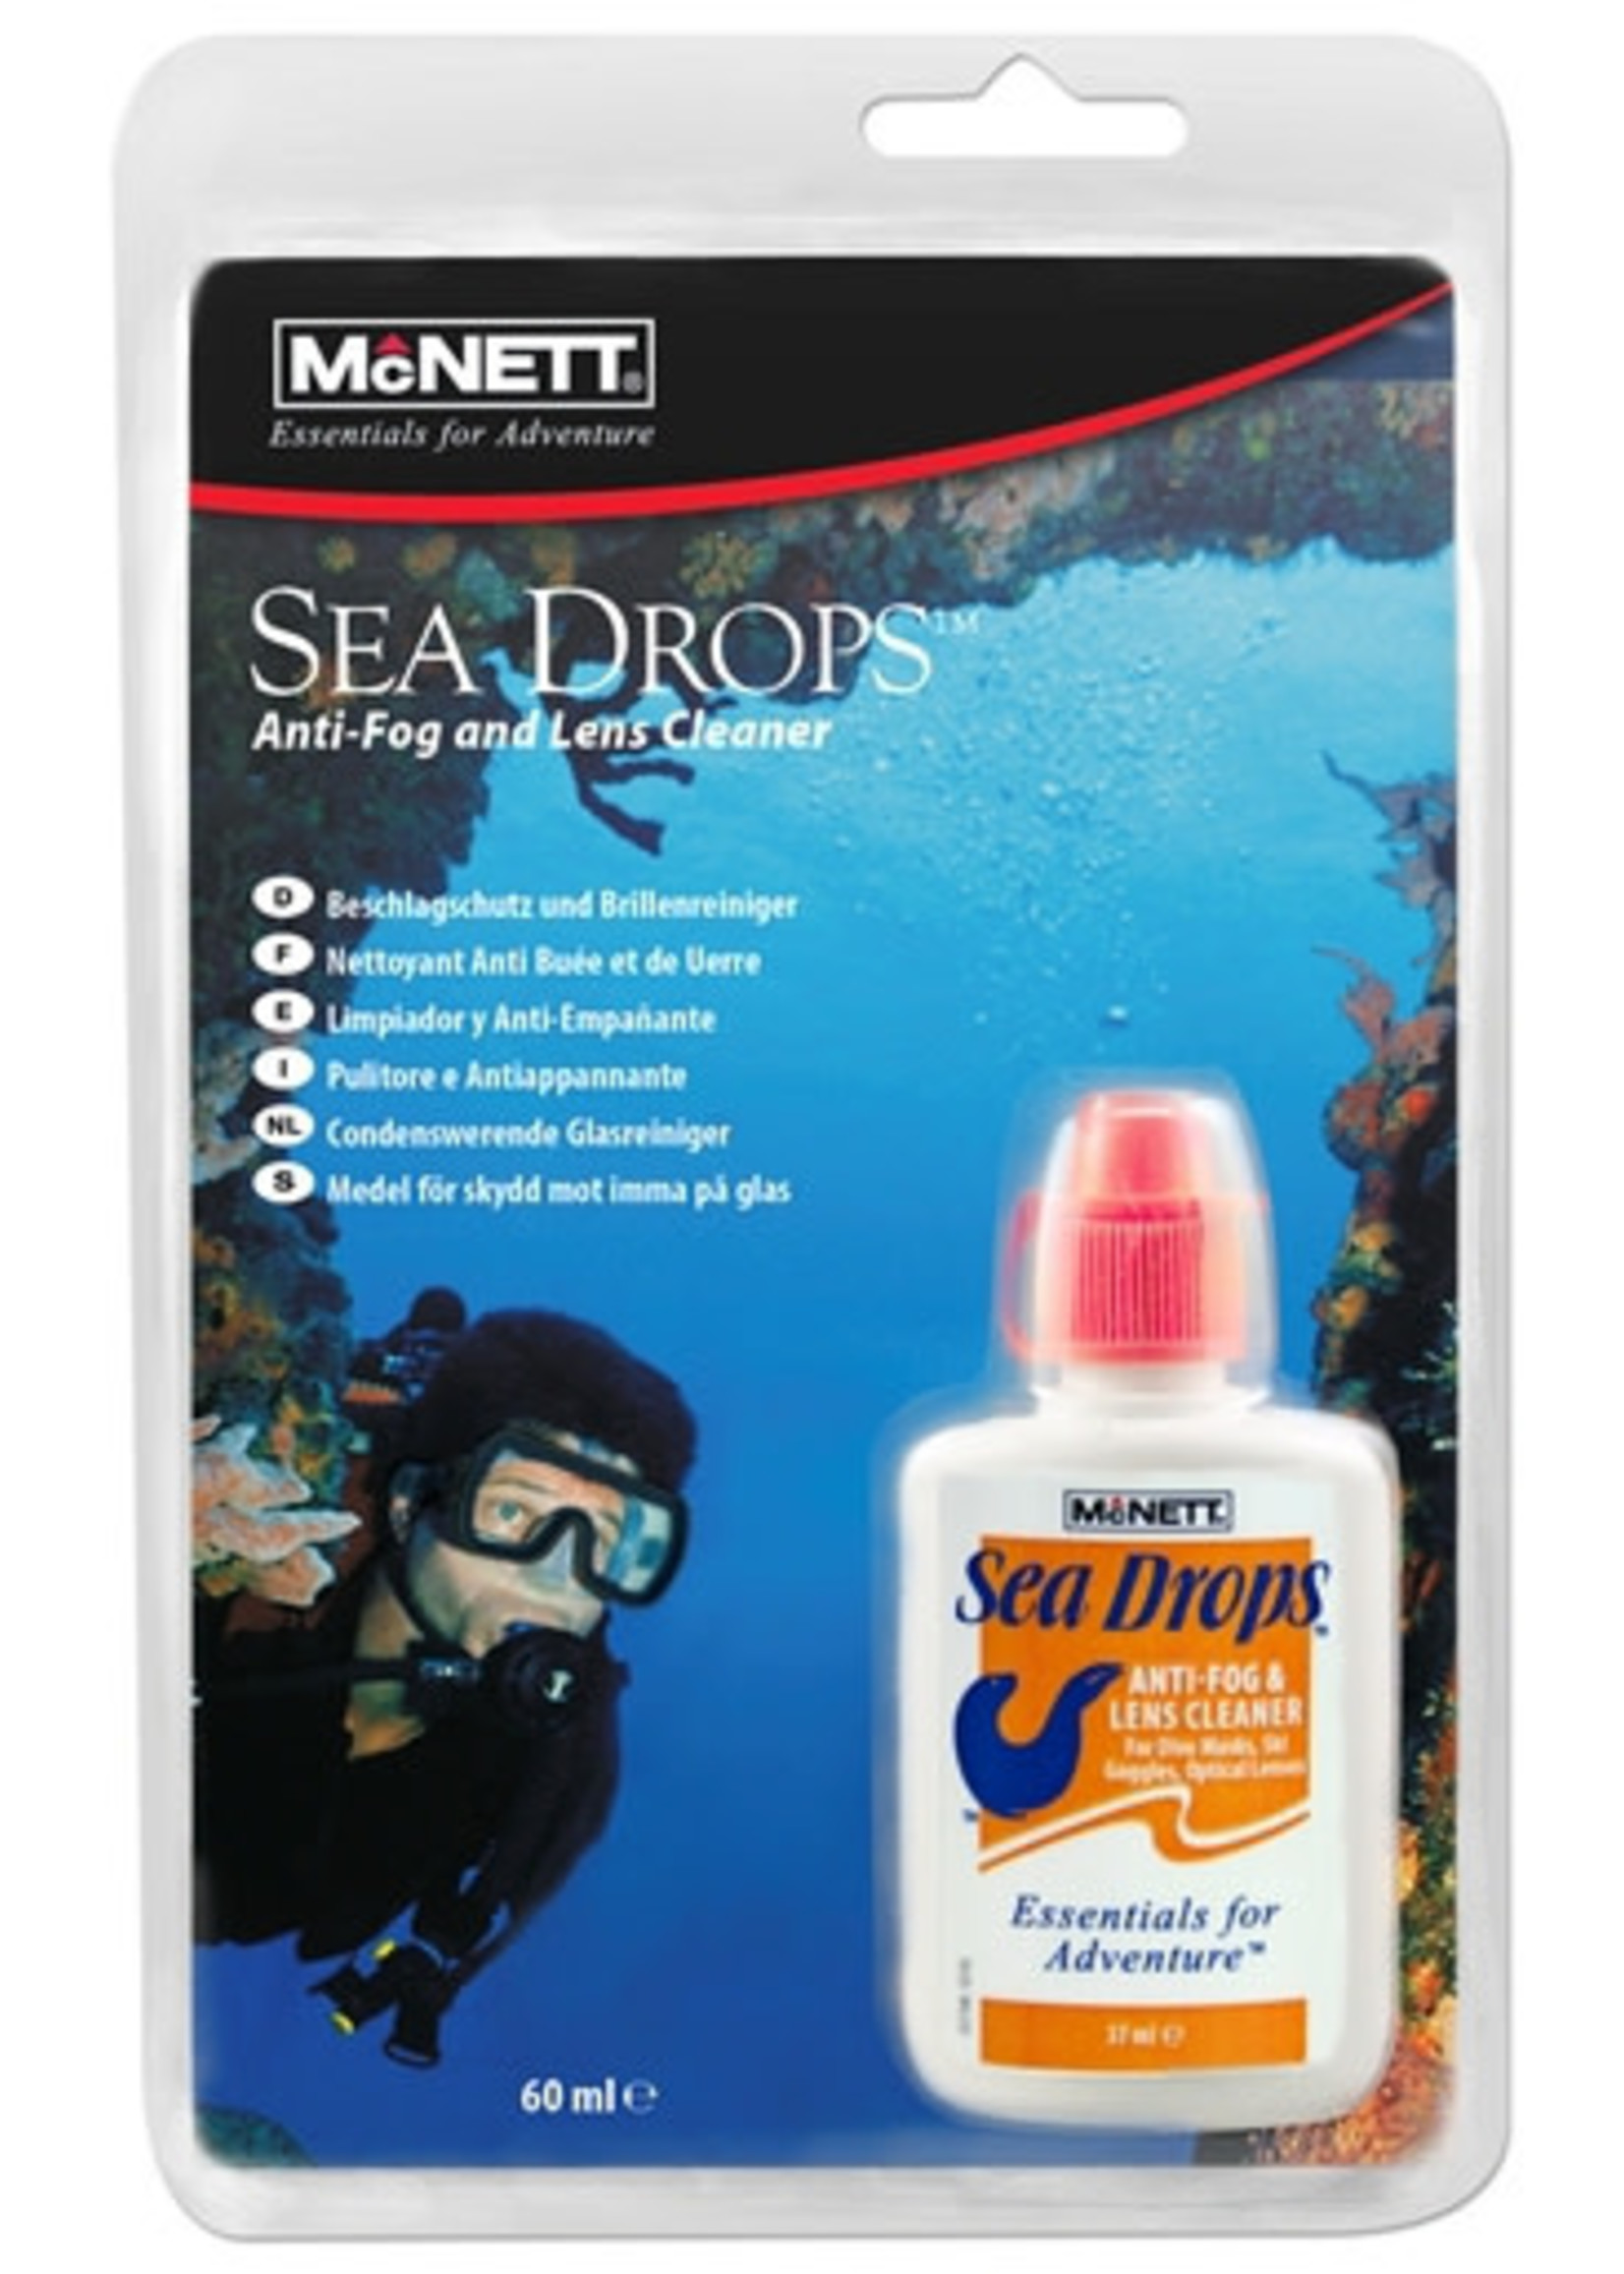 McNett-GearAid McNett-GearAid Seadrops 37ml